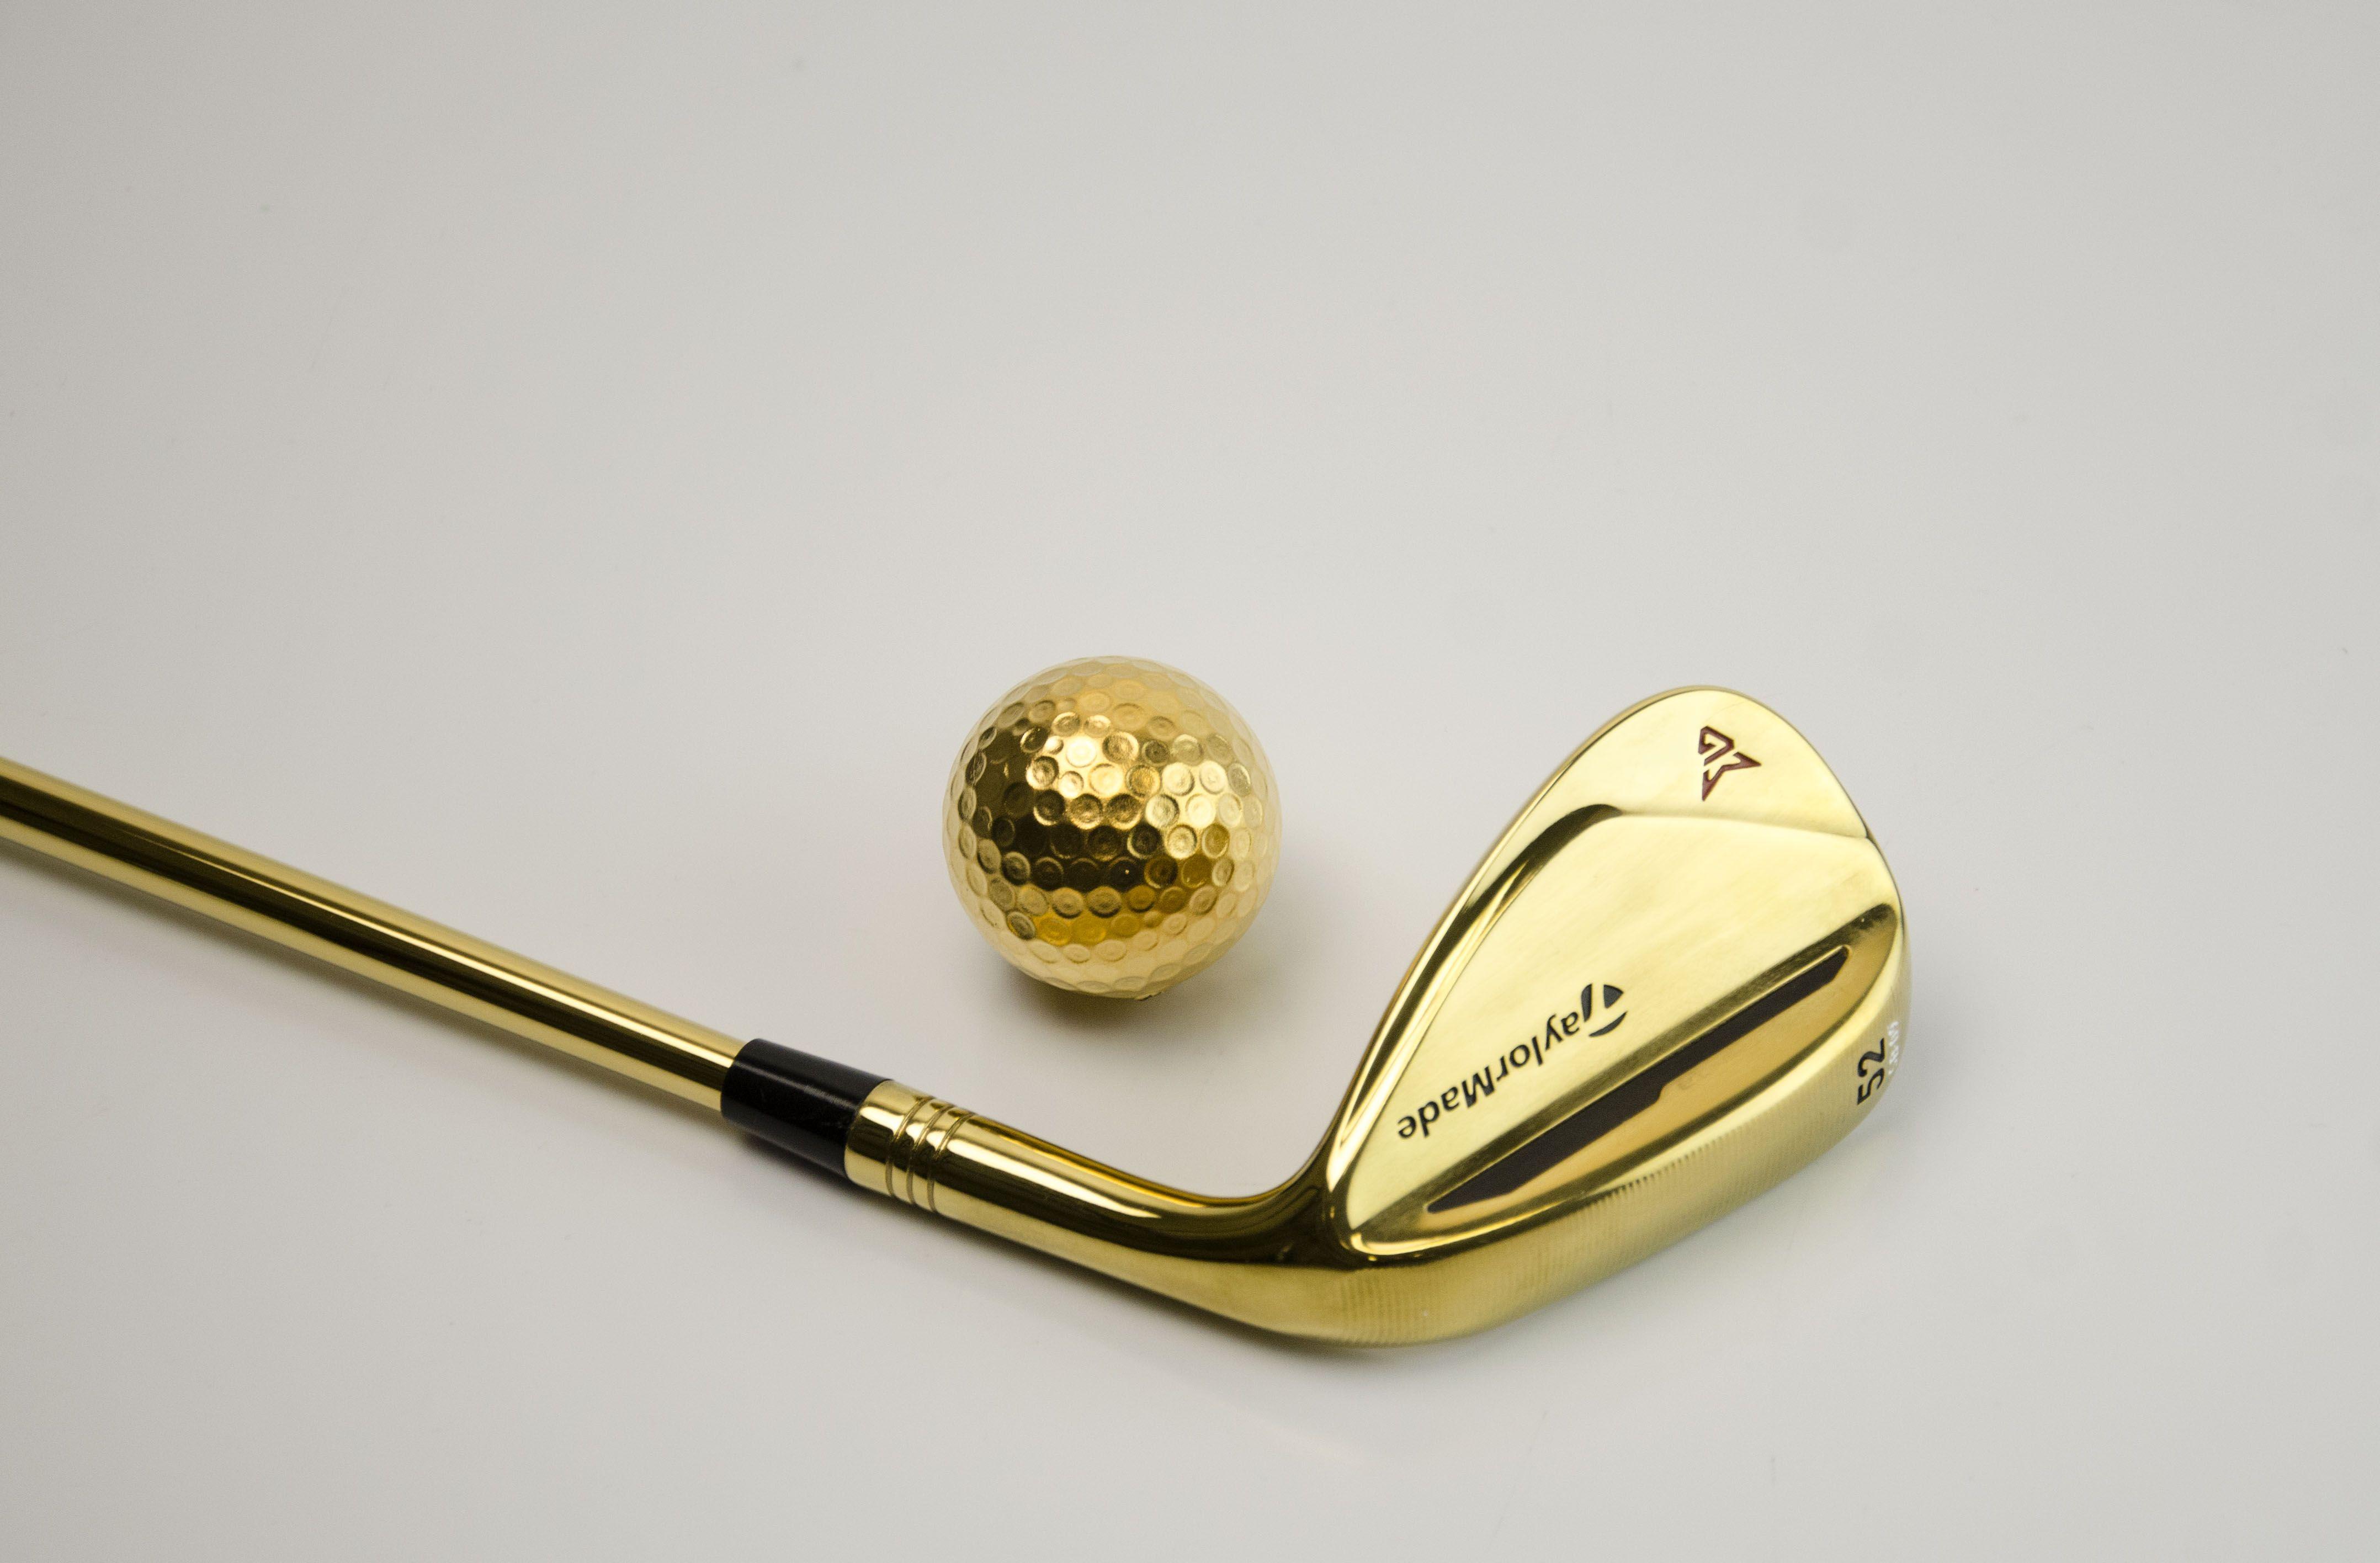 24k gold golf ball club zinc plating nickel plating